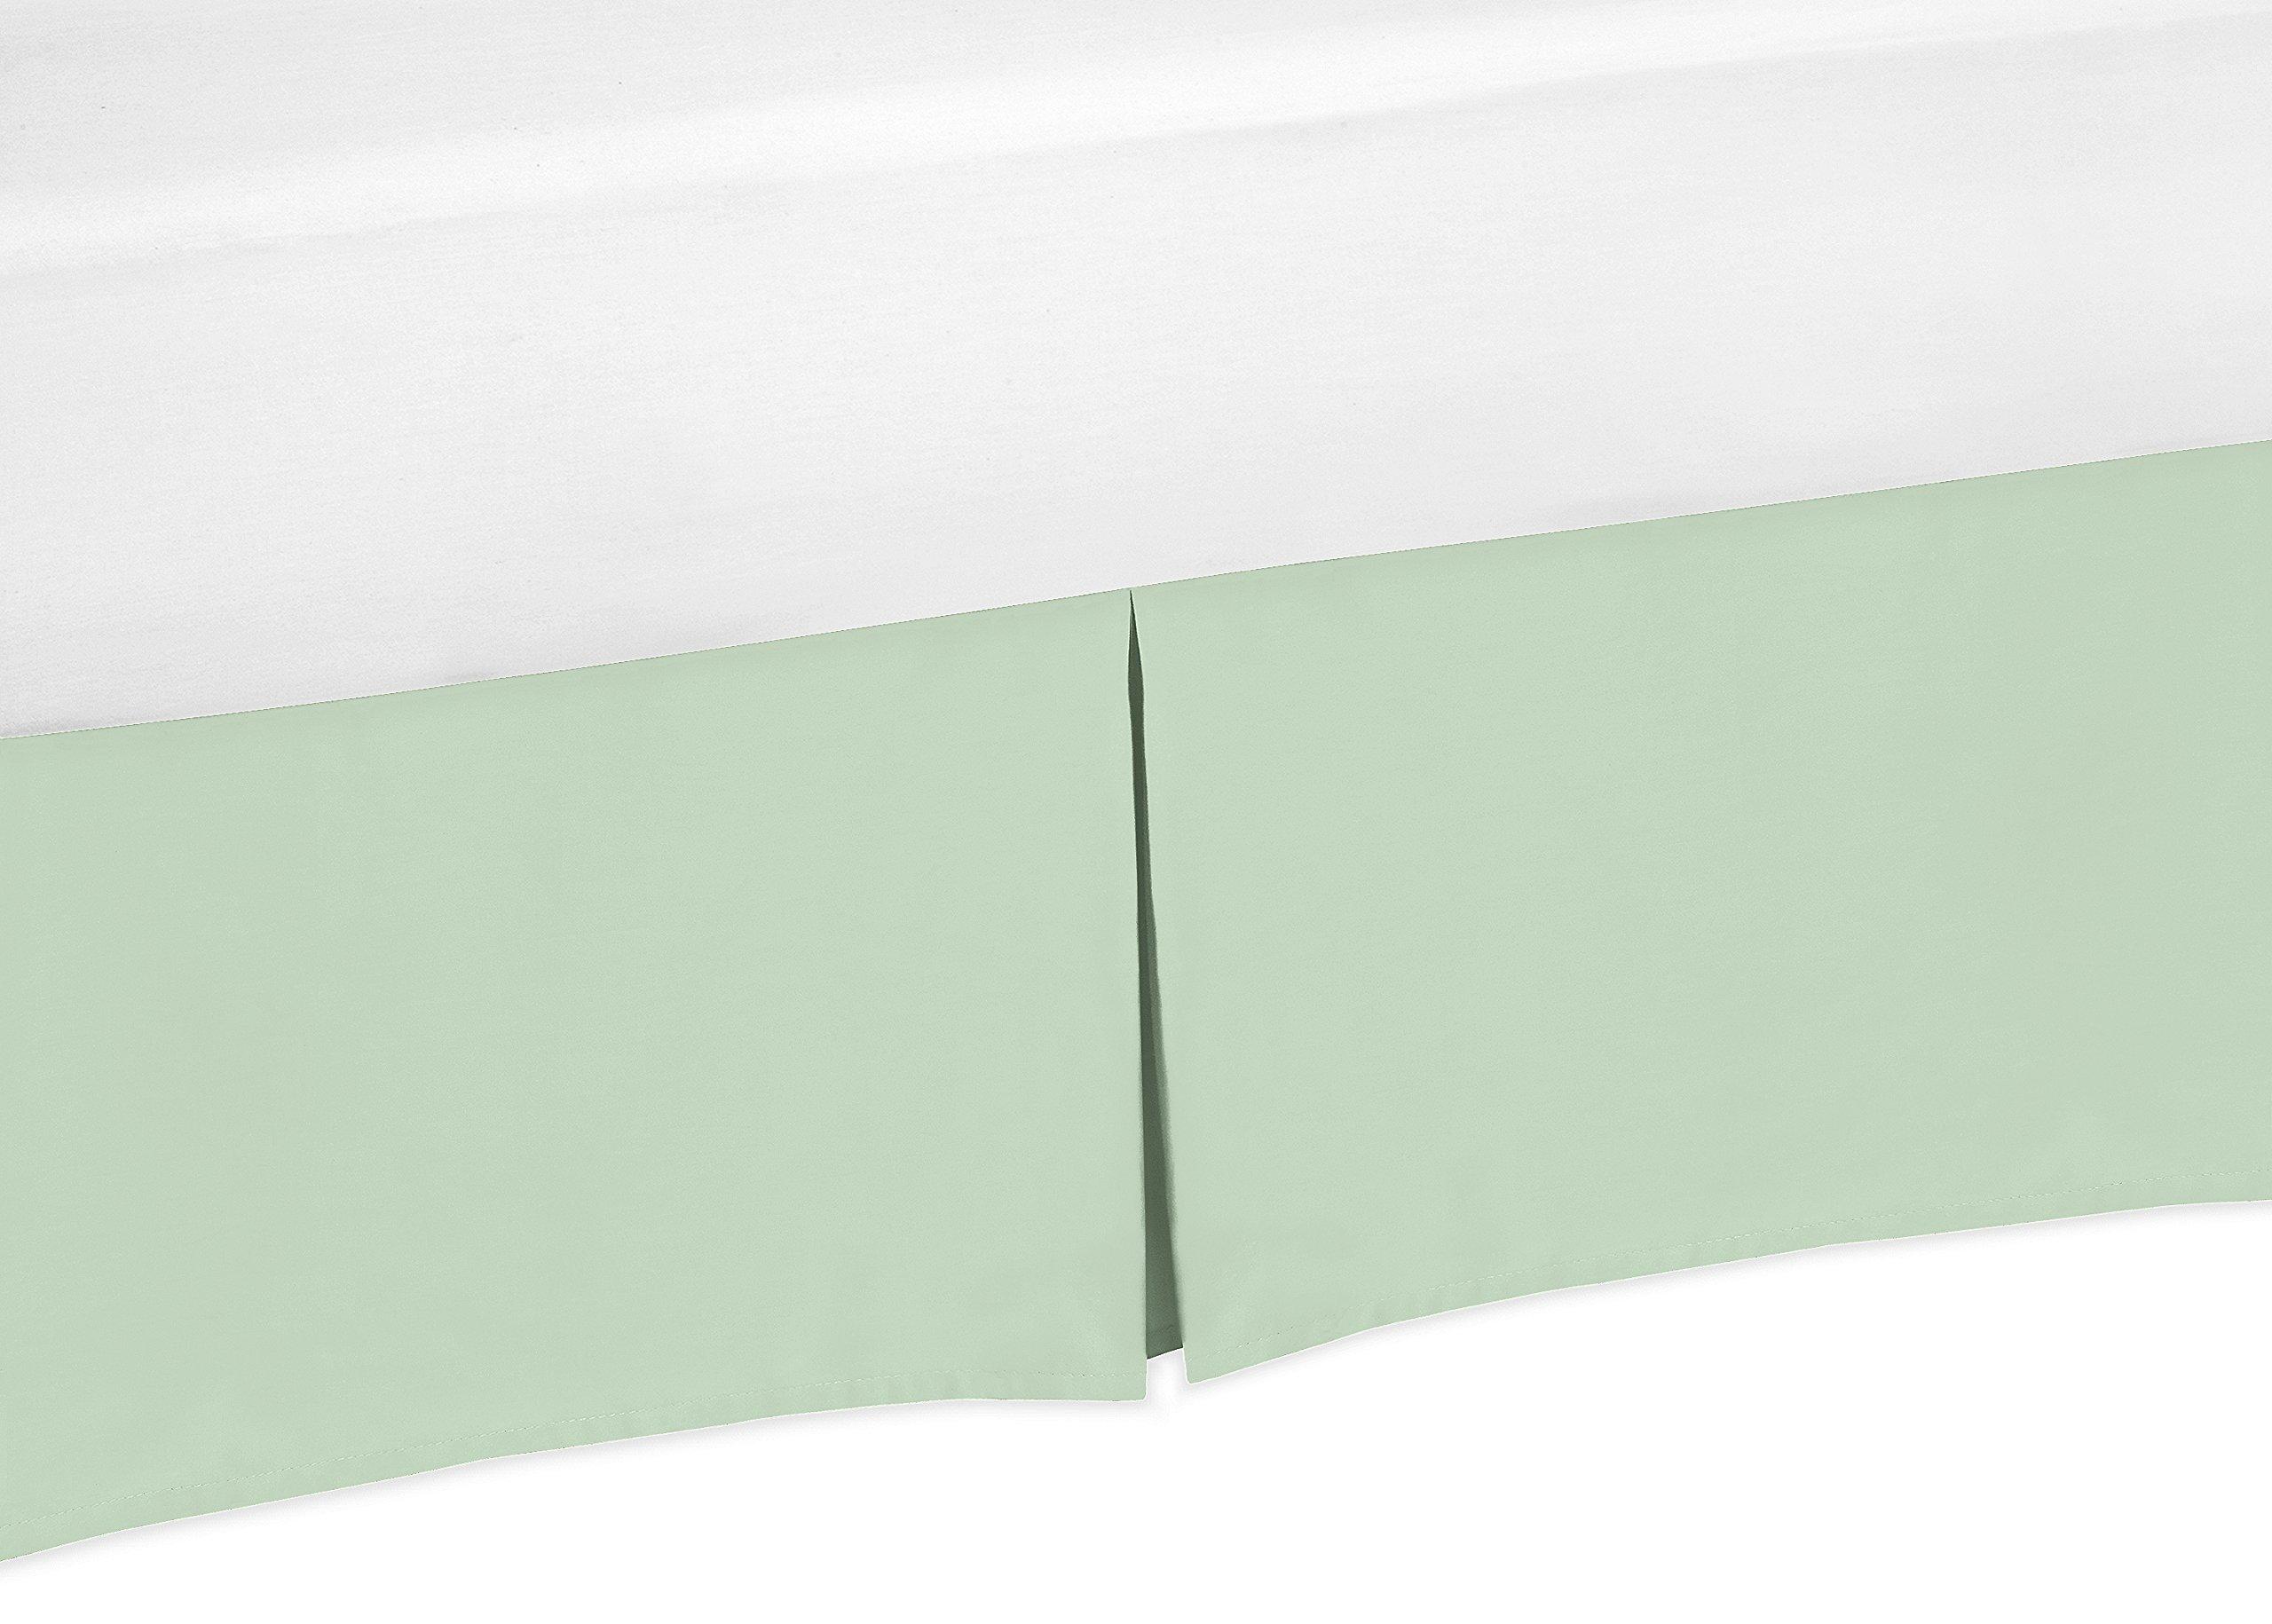 Sweet Jojo Designs Mint Green Crib Bed Skirt forBaby Bedding Sets